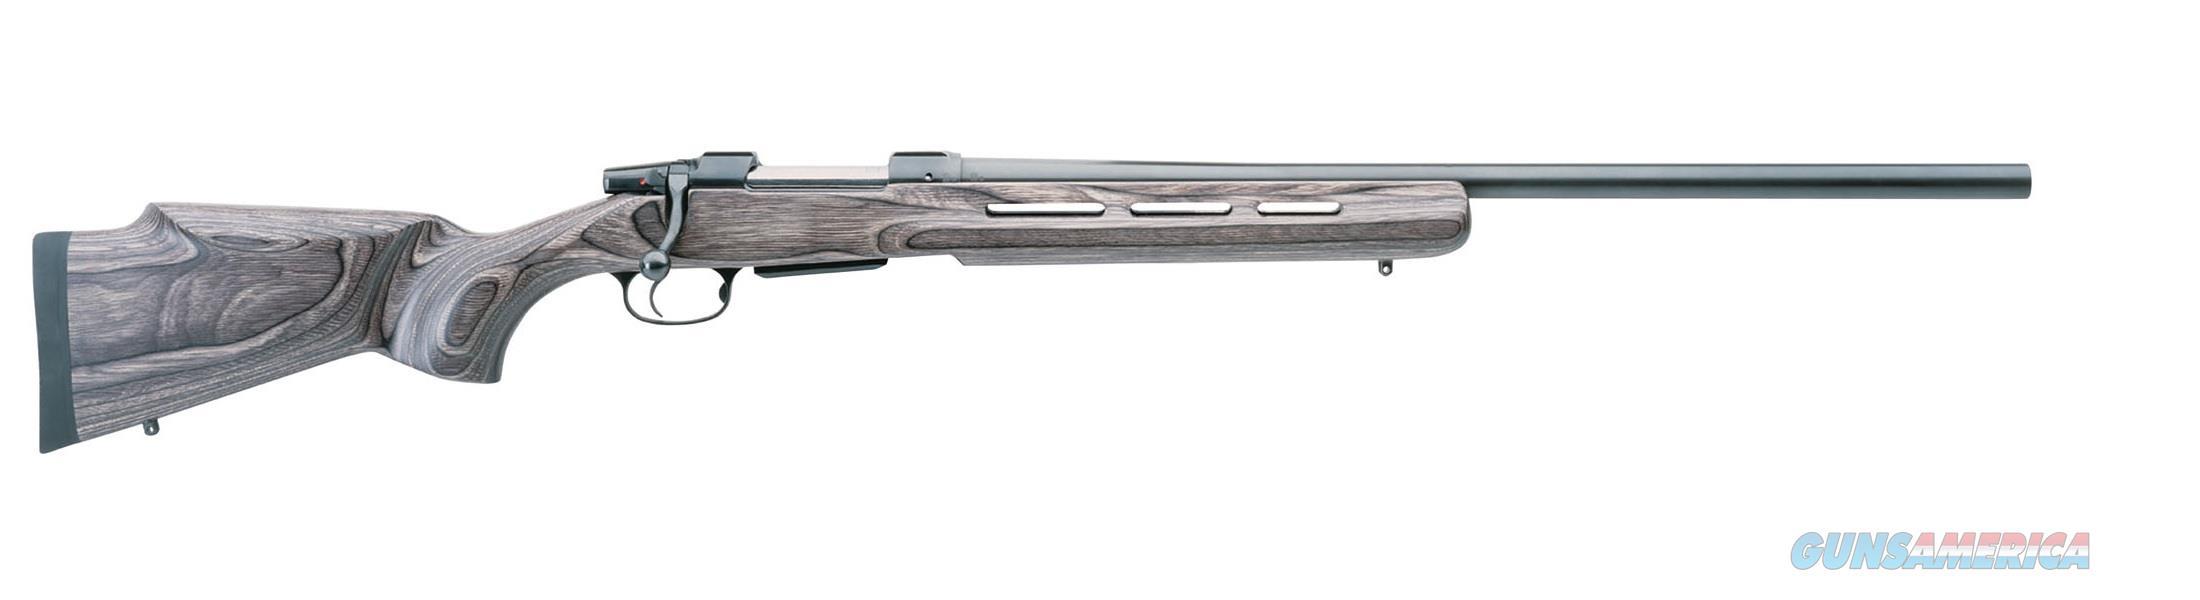 "CZ-USA 550 Varmint .308 Win 25.6"" Heavy Barrel 04161   Guns > Rifles > CZ Rifles"